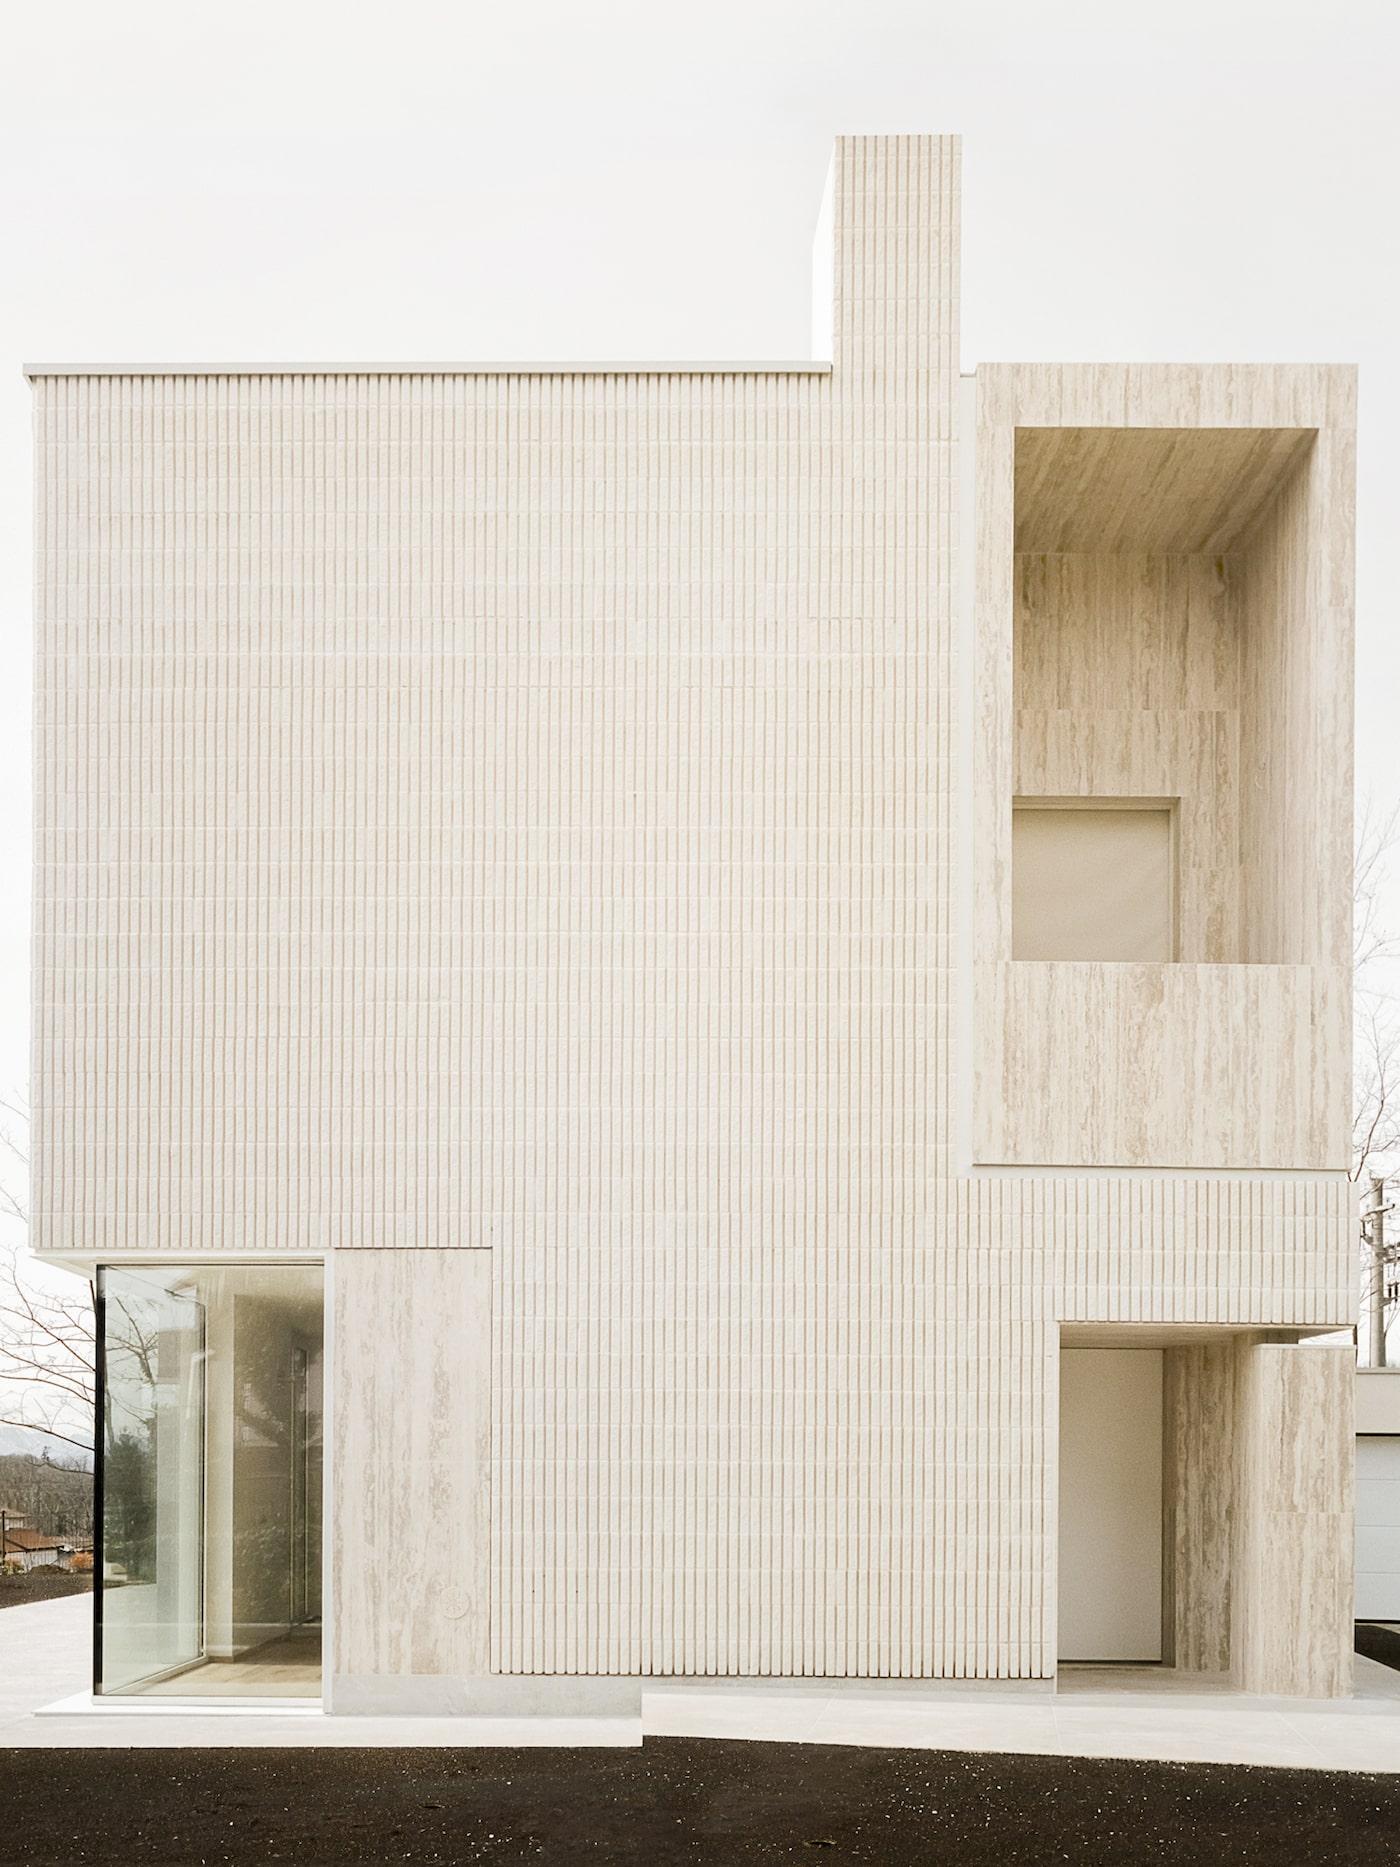 Figini apartments with timber facade